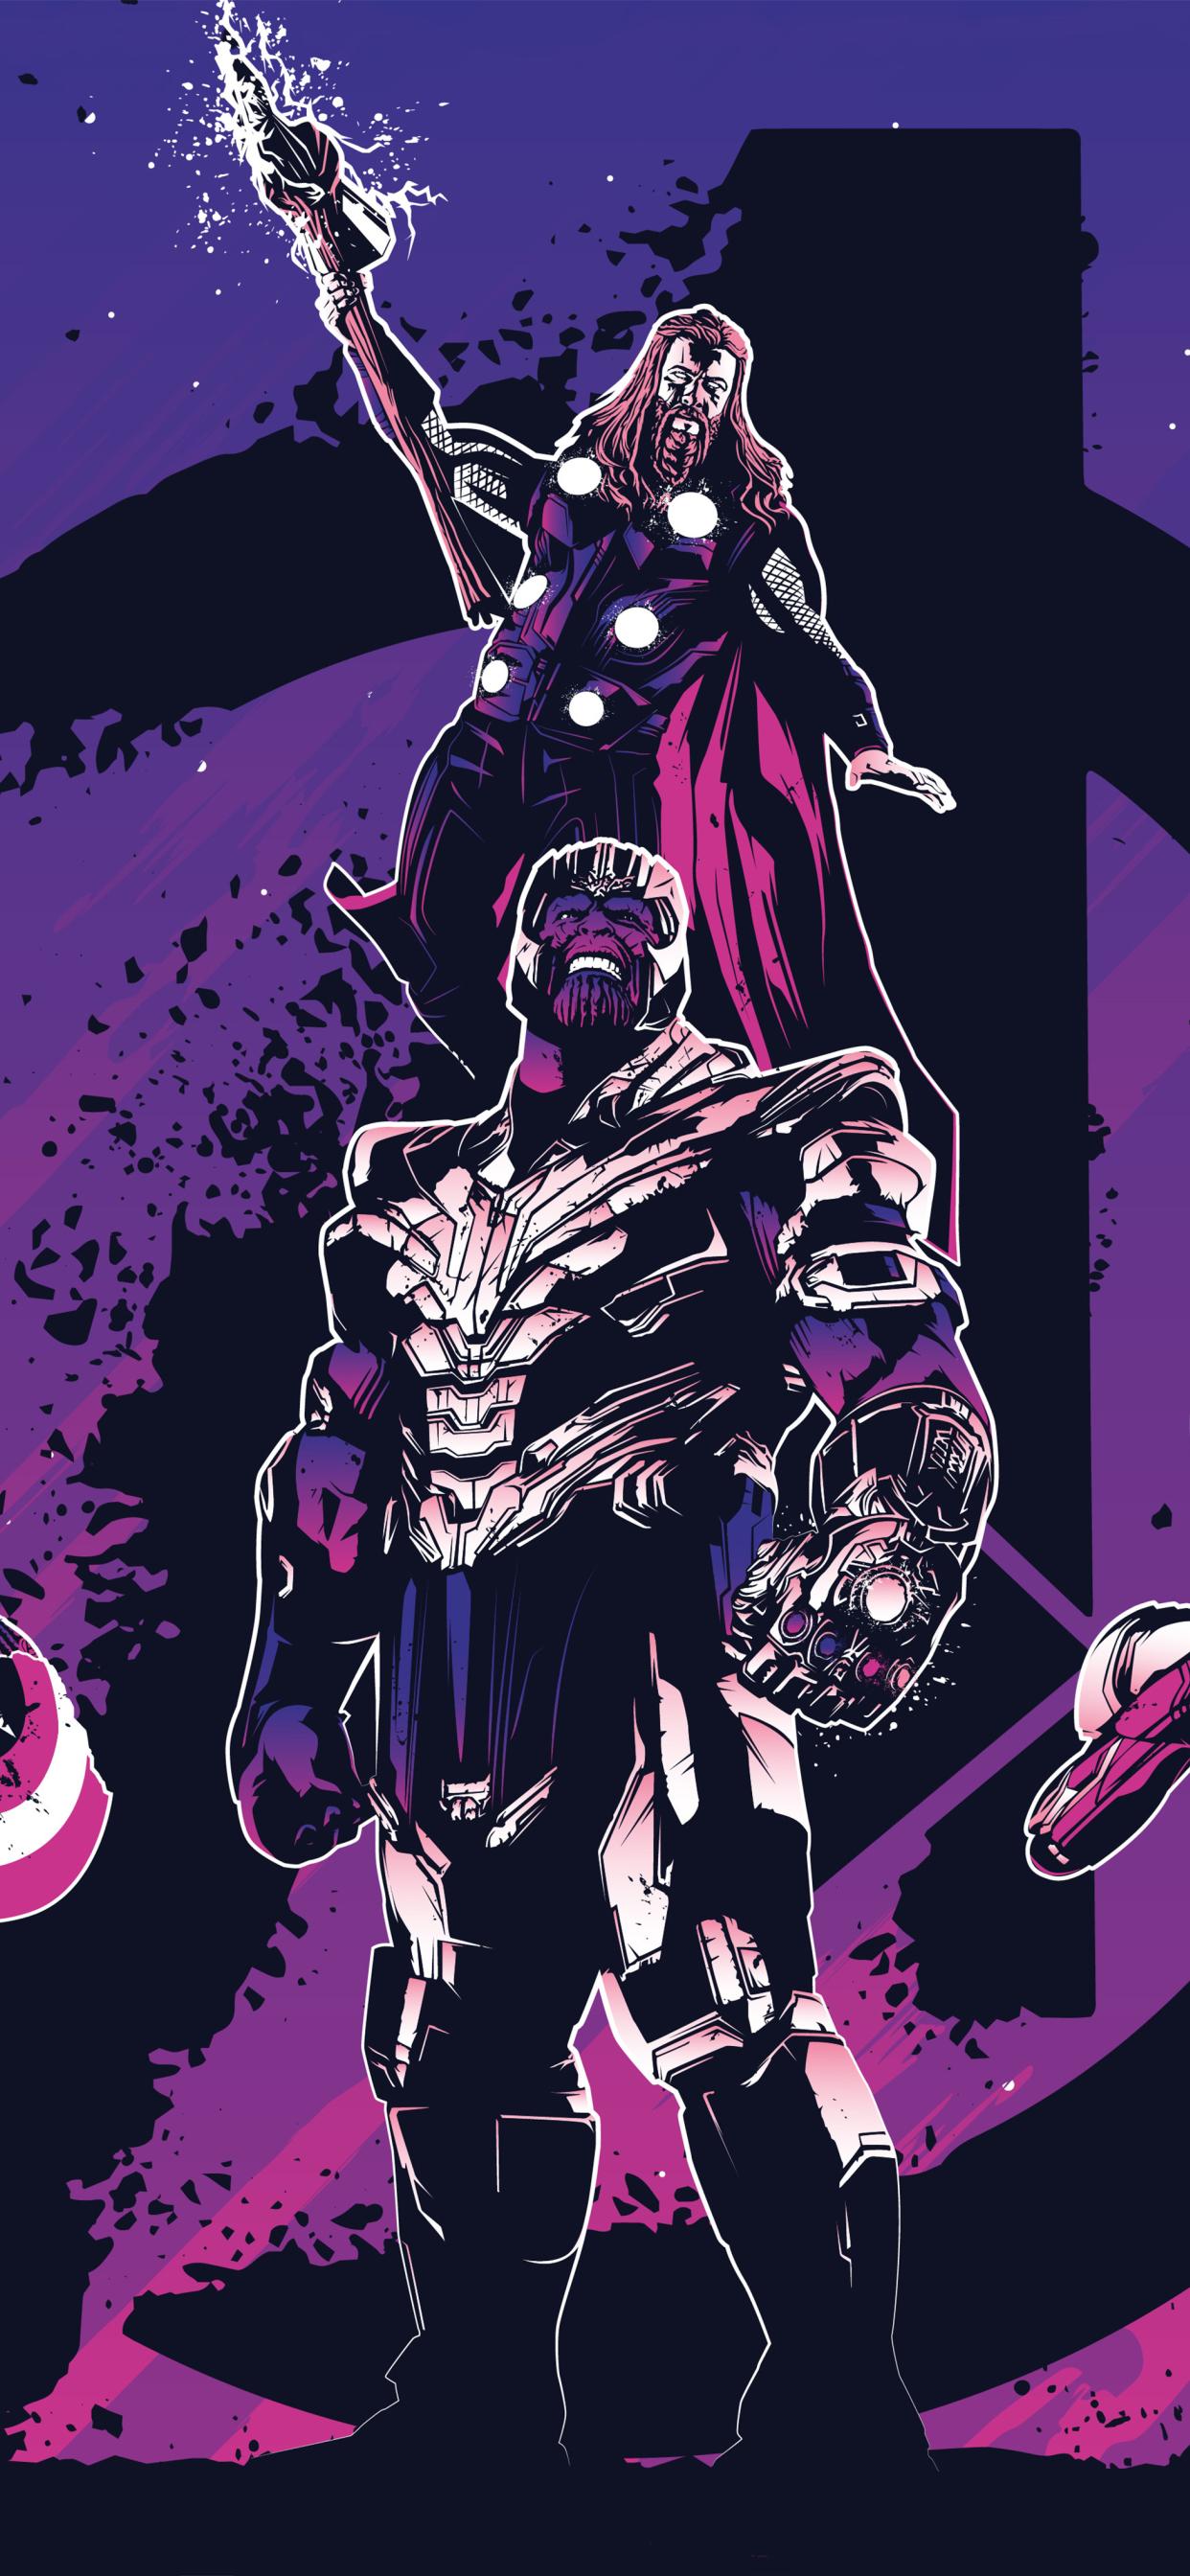 1242x2688 New Avengers Endgame 4K Iphone XS MAX Wallpaper ...